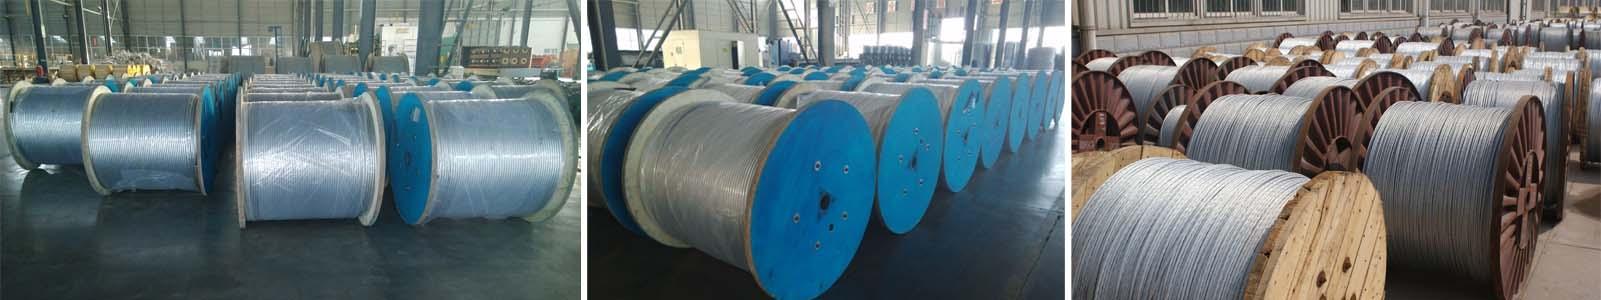 zebra conductor cable plant